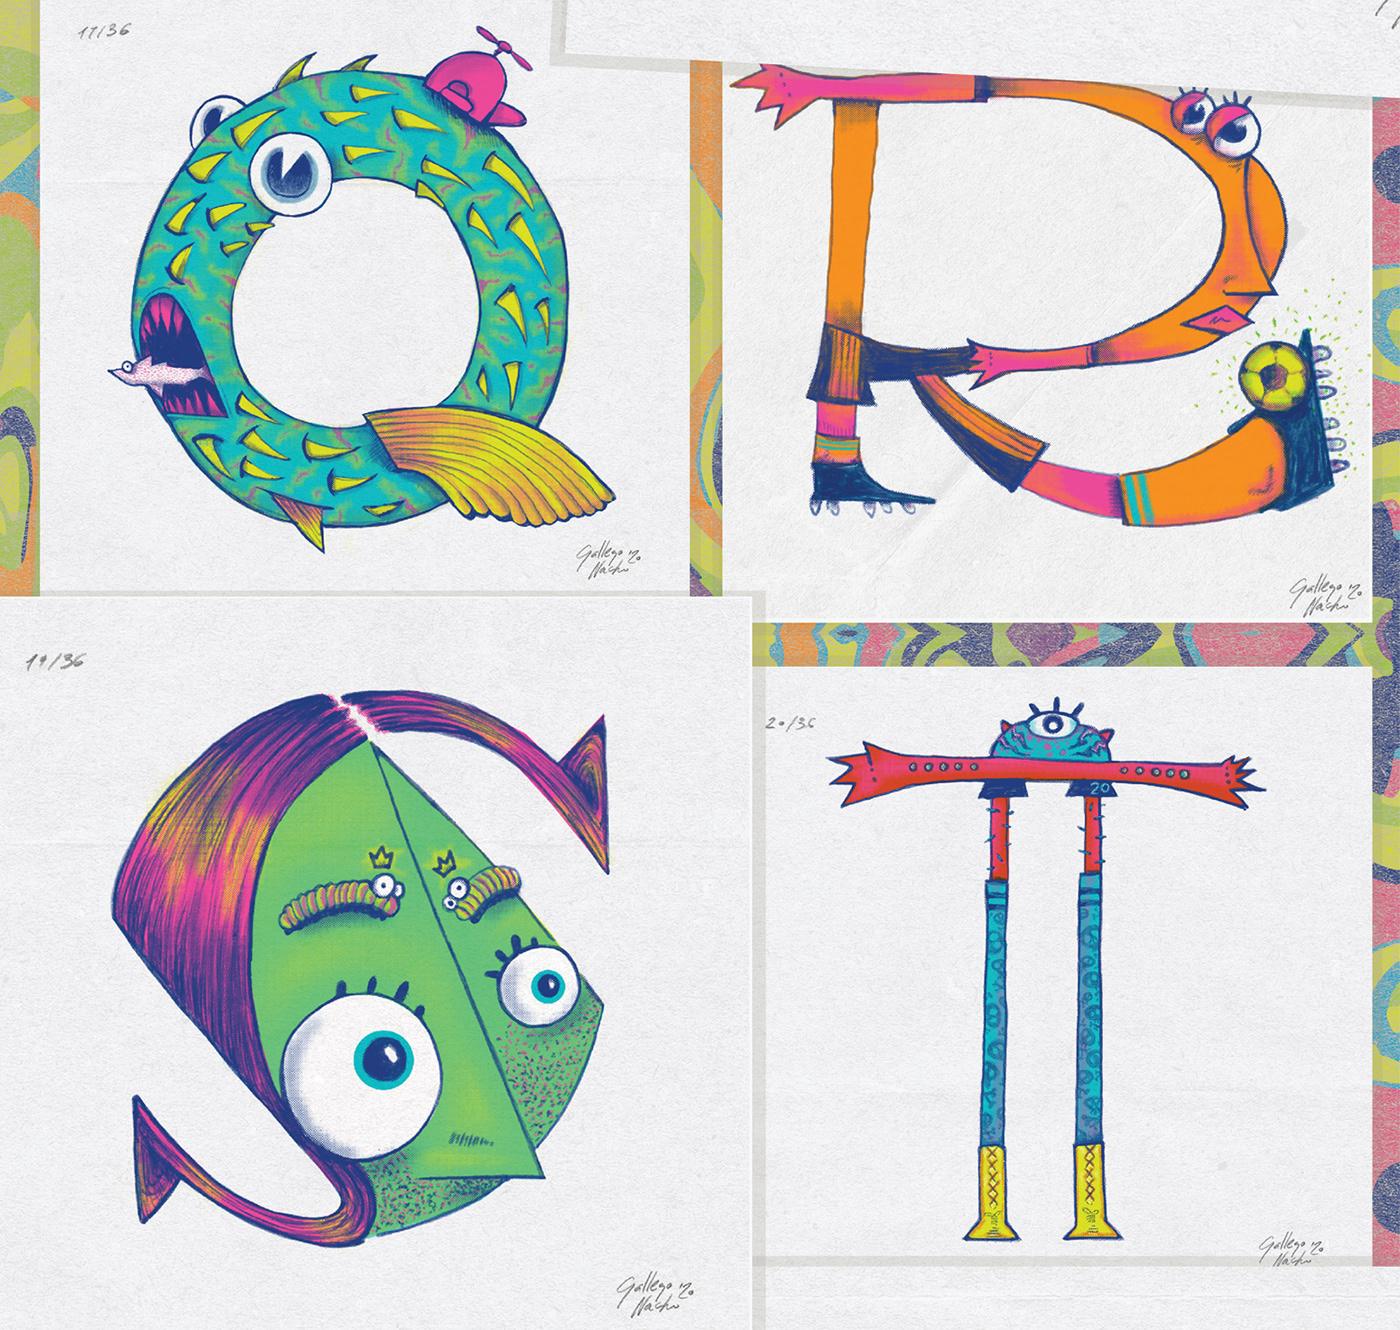 36daysoftype typo alphabet 36daysoftype2020 draw Drawing  pen photoshop Typeface typography